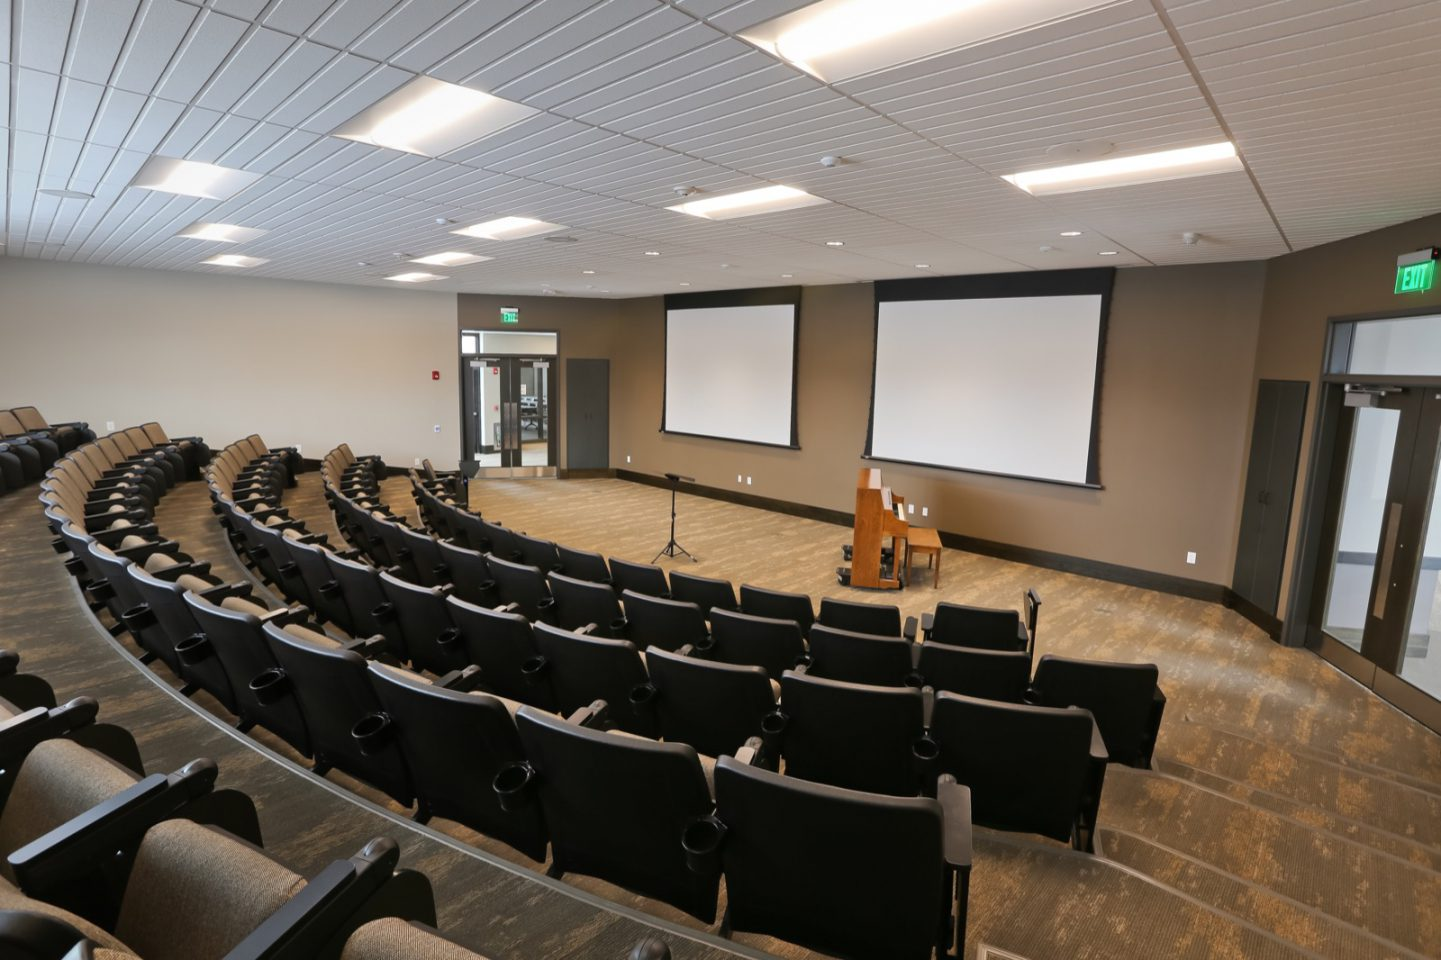 Our Savior Lutheran Church auditorium